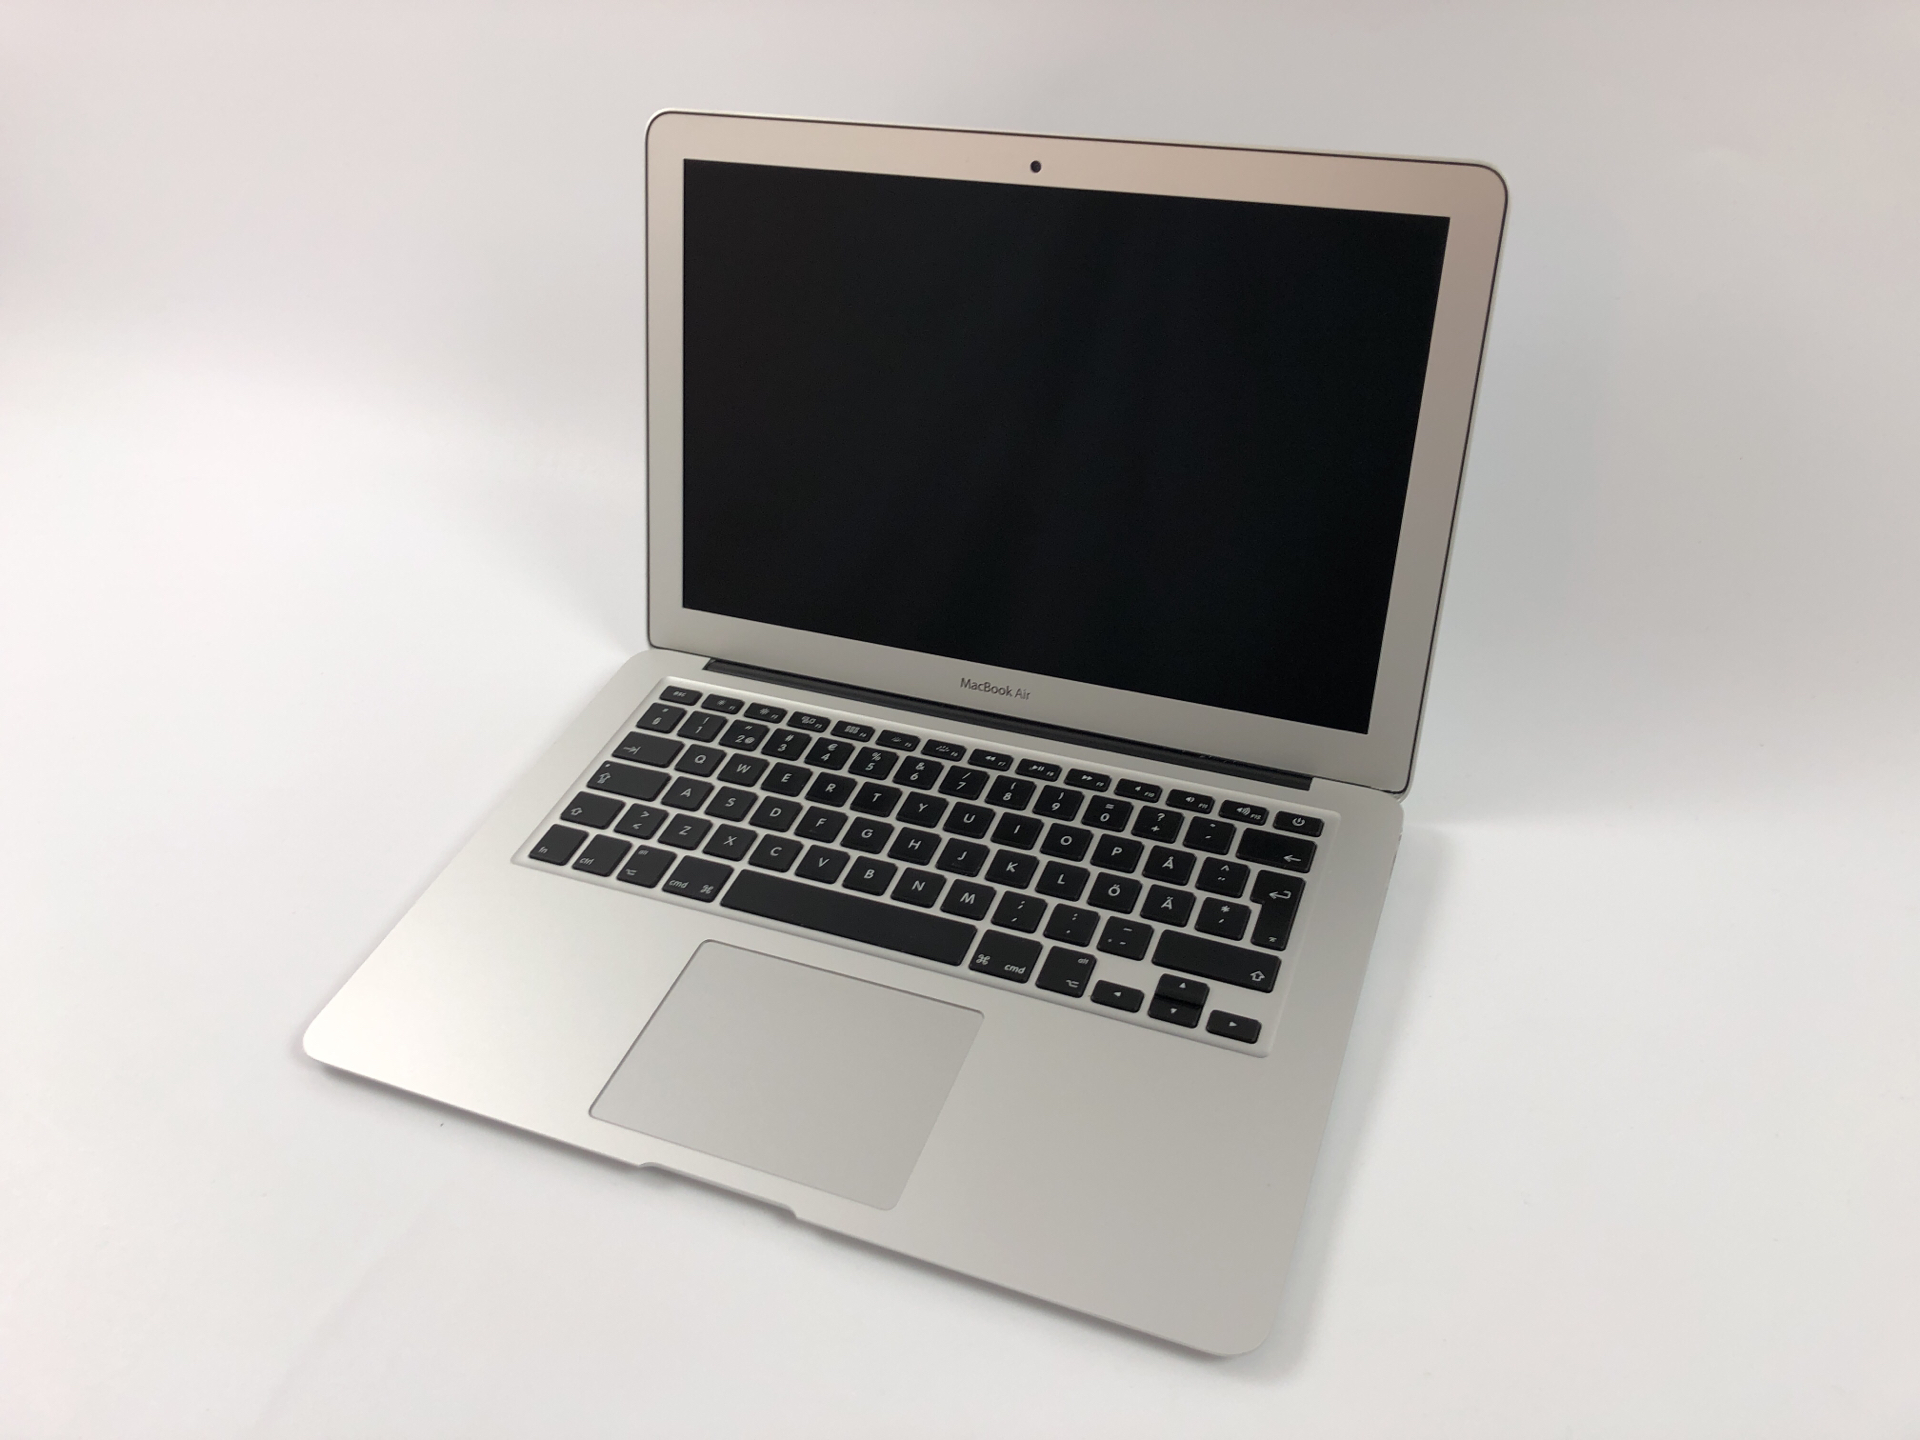 "MacBook Air 13"" Early 2014 (Intel Core i5 1.4 GHz 4 GB RAM 256 GB SSD), Intel Core i5 1.4 GHz, 4 GB RAM, 256 GB SSD, Kuva 1"